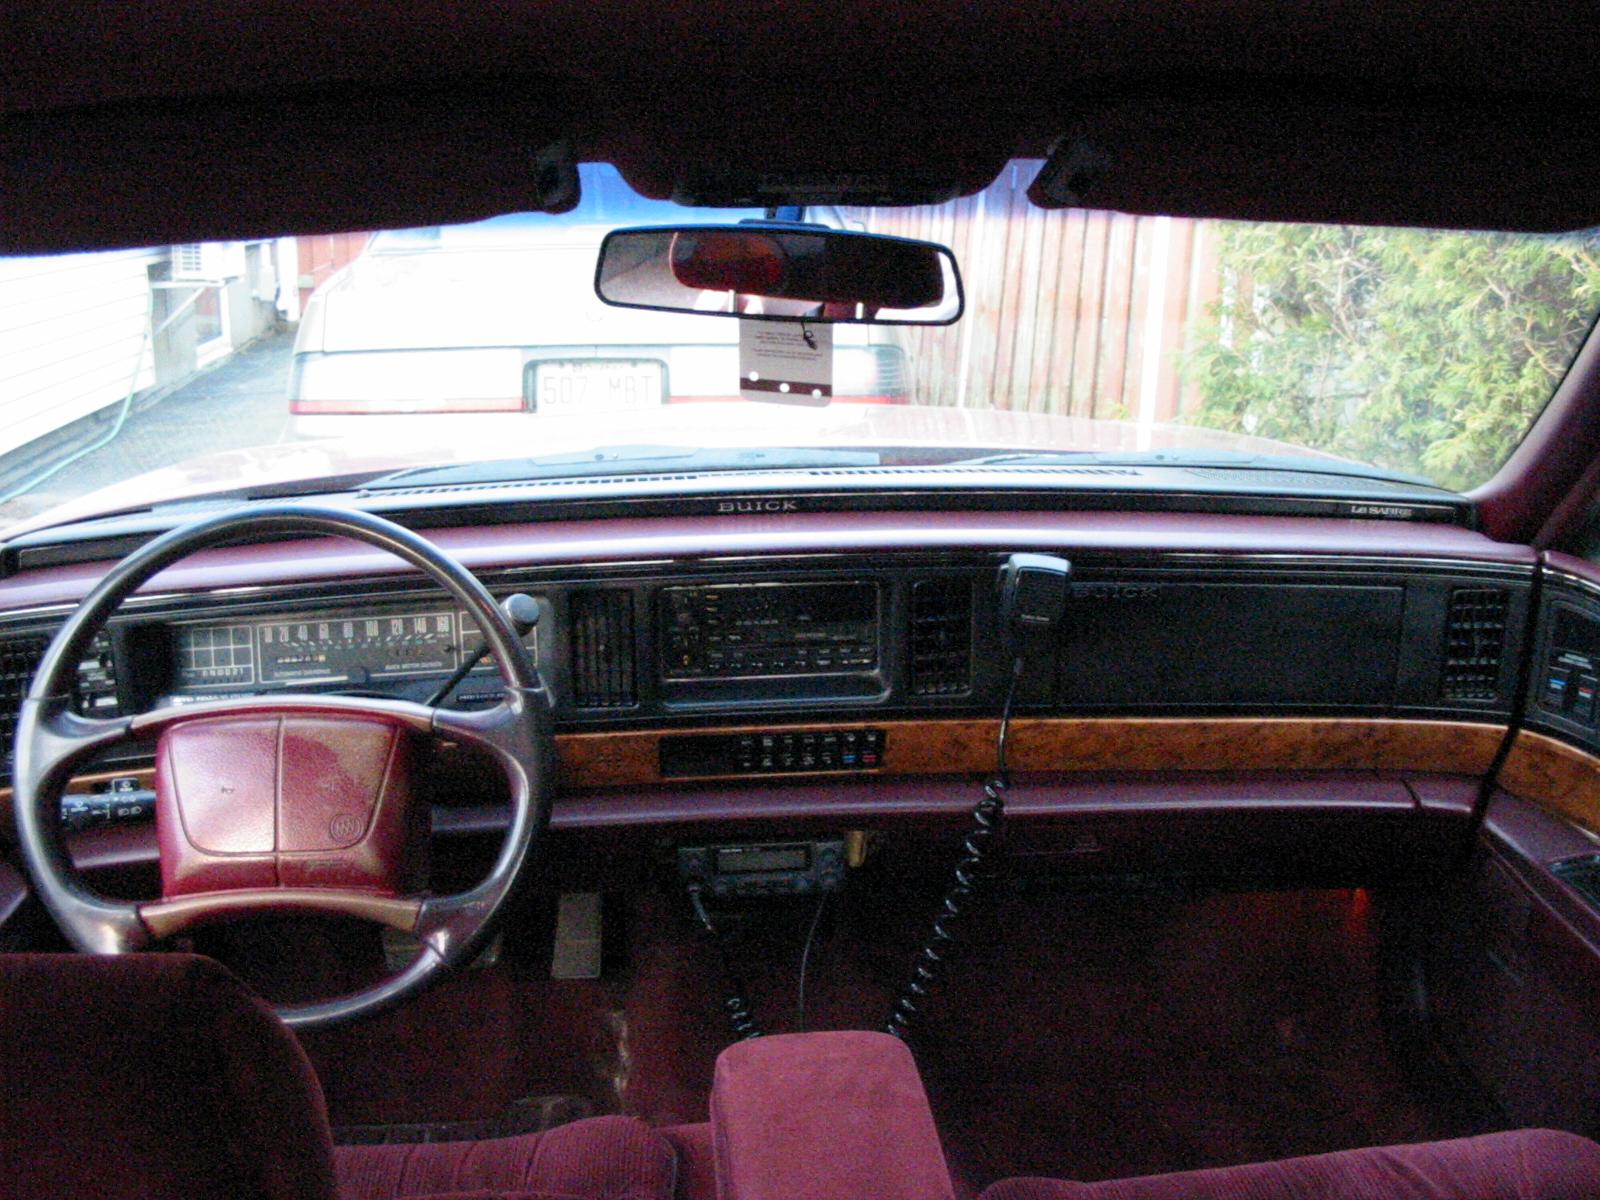 1995 Buick LeSabre Custom - Pictures - 1995 Buick LeSabre 4 Dr Custom ...